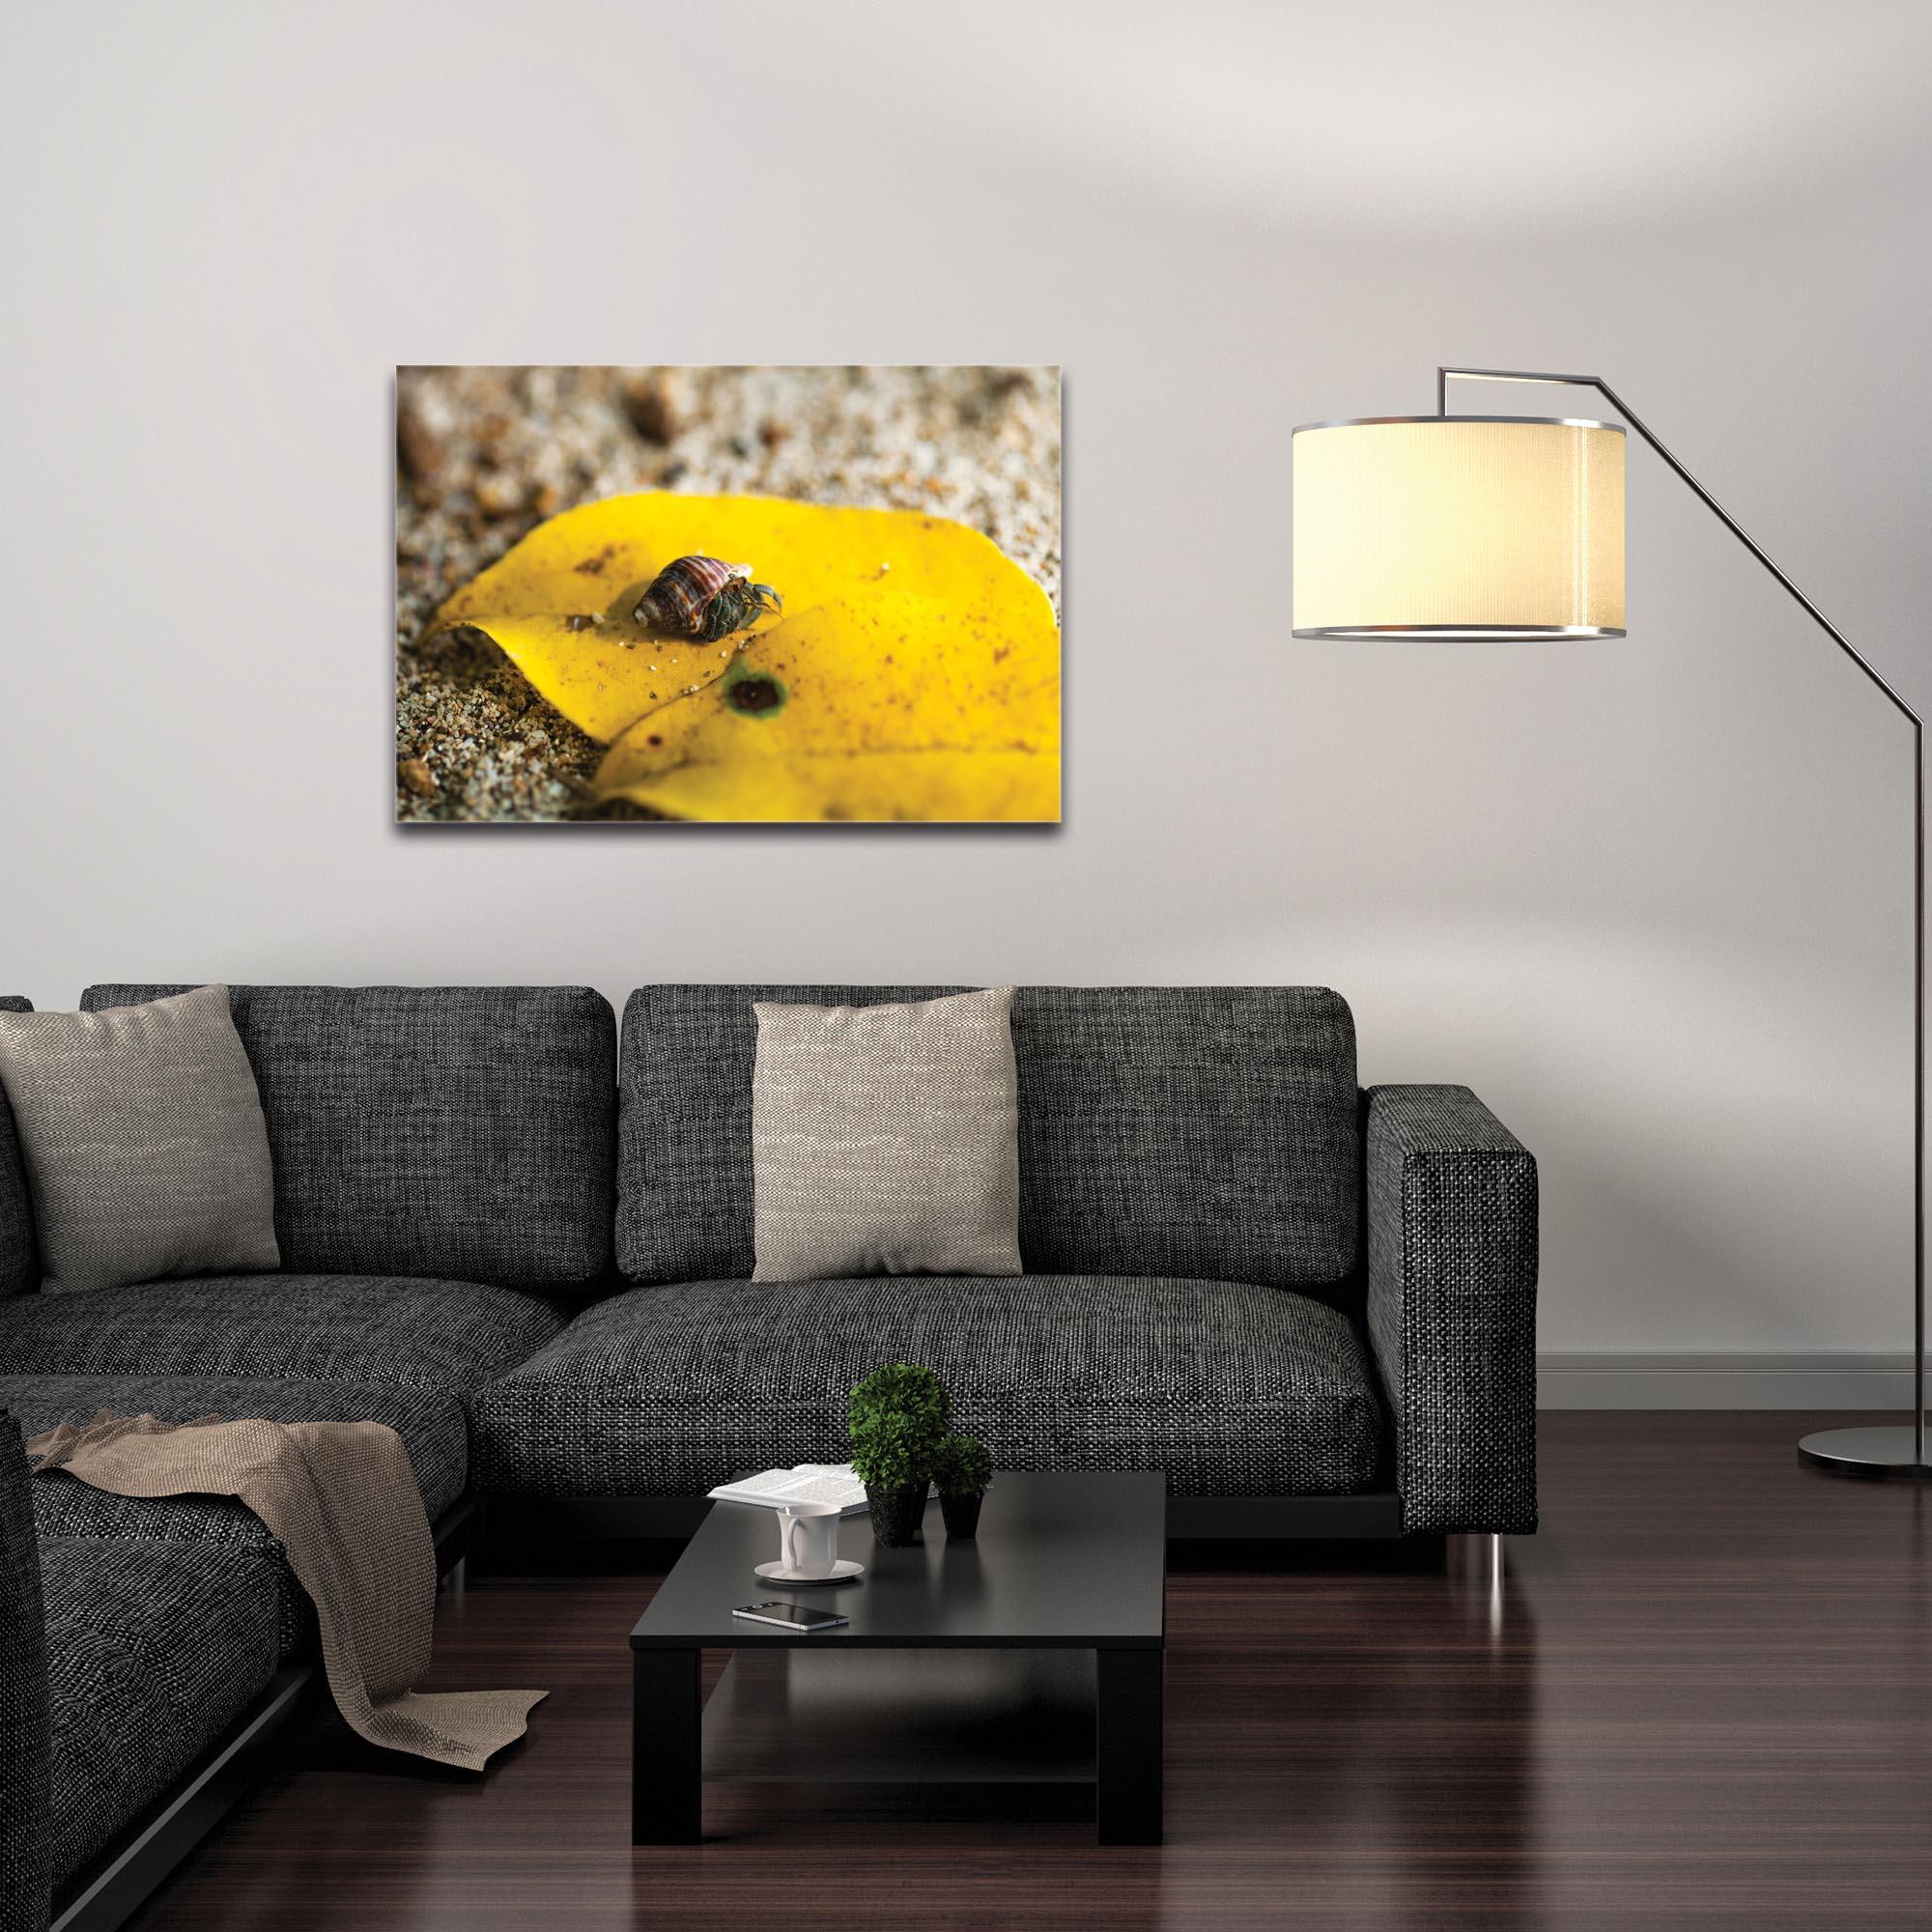 Nature Photography 'Hermit Life' - Hermit Crab Art on Metal or Plexiglass - Image 3